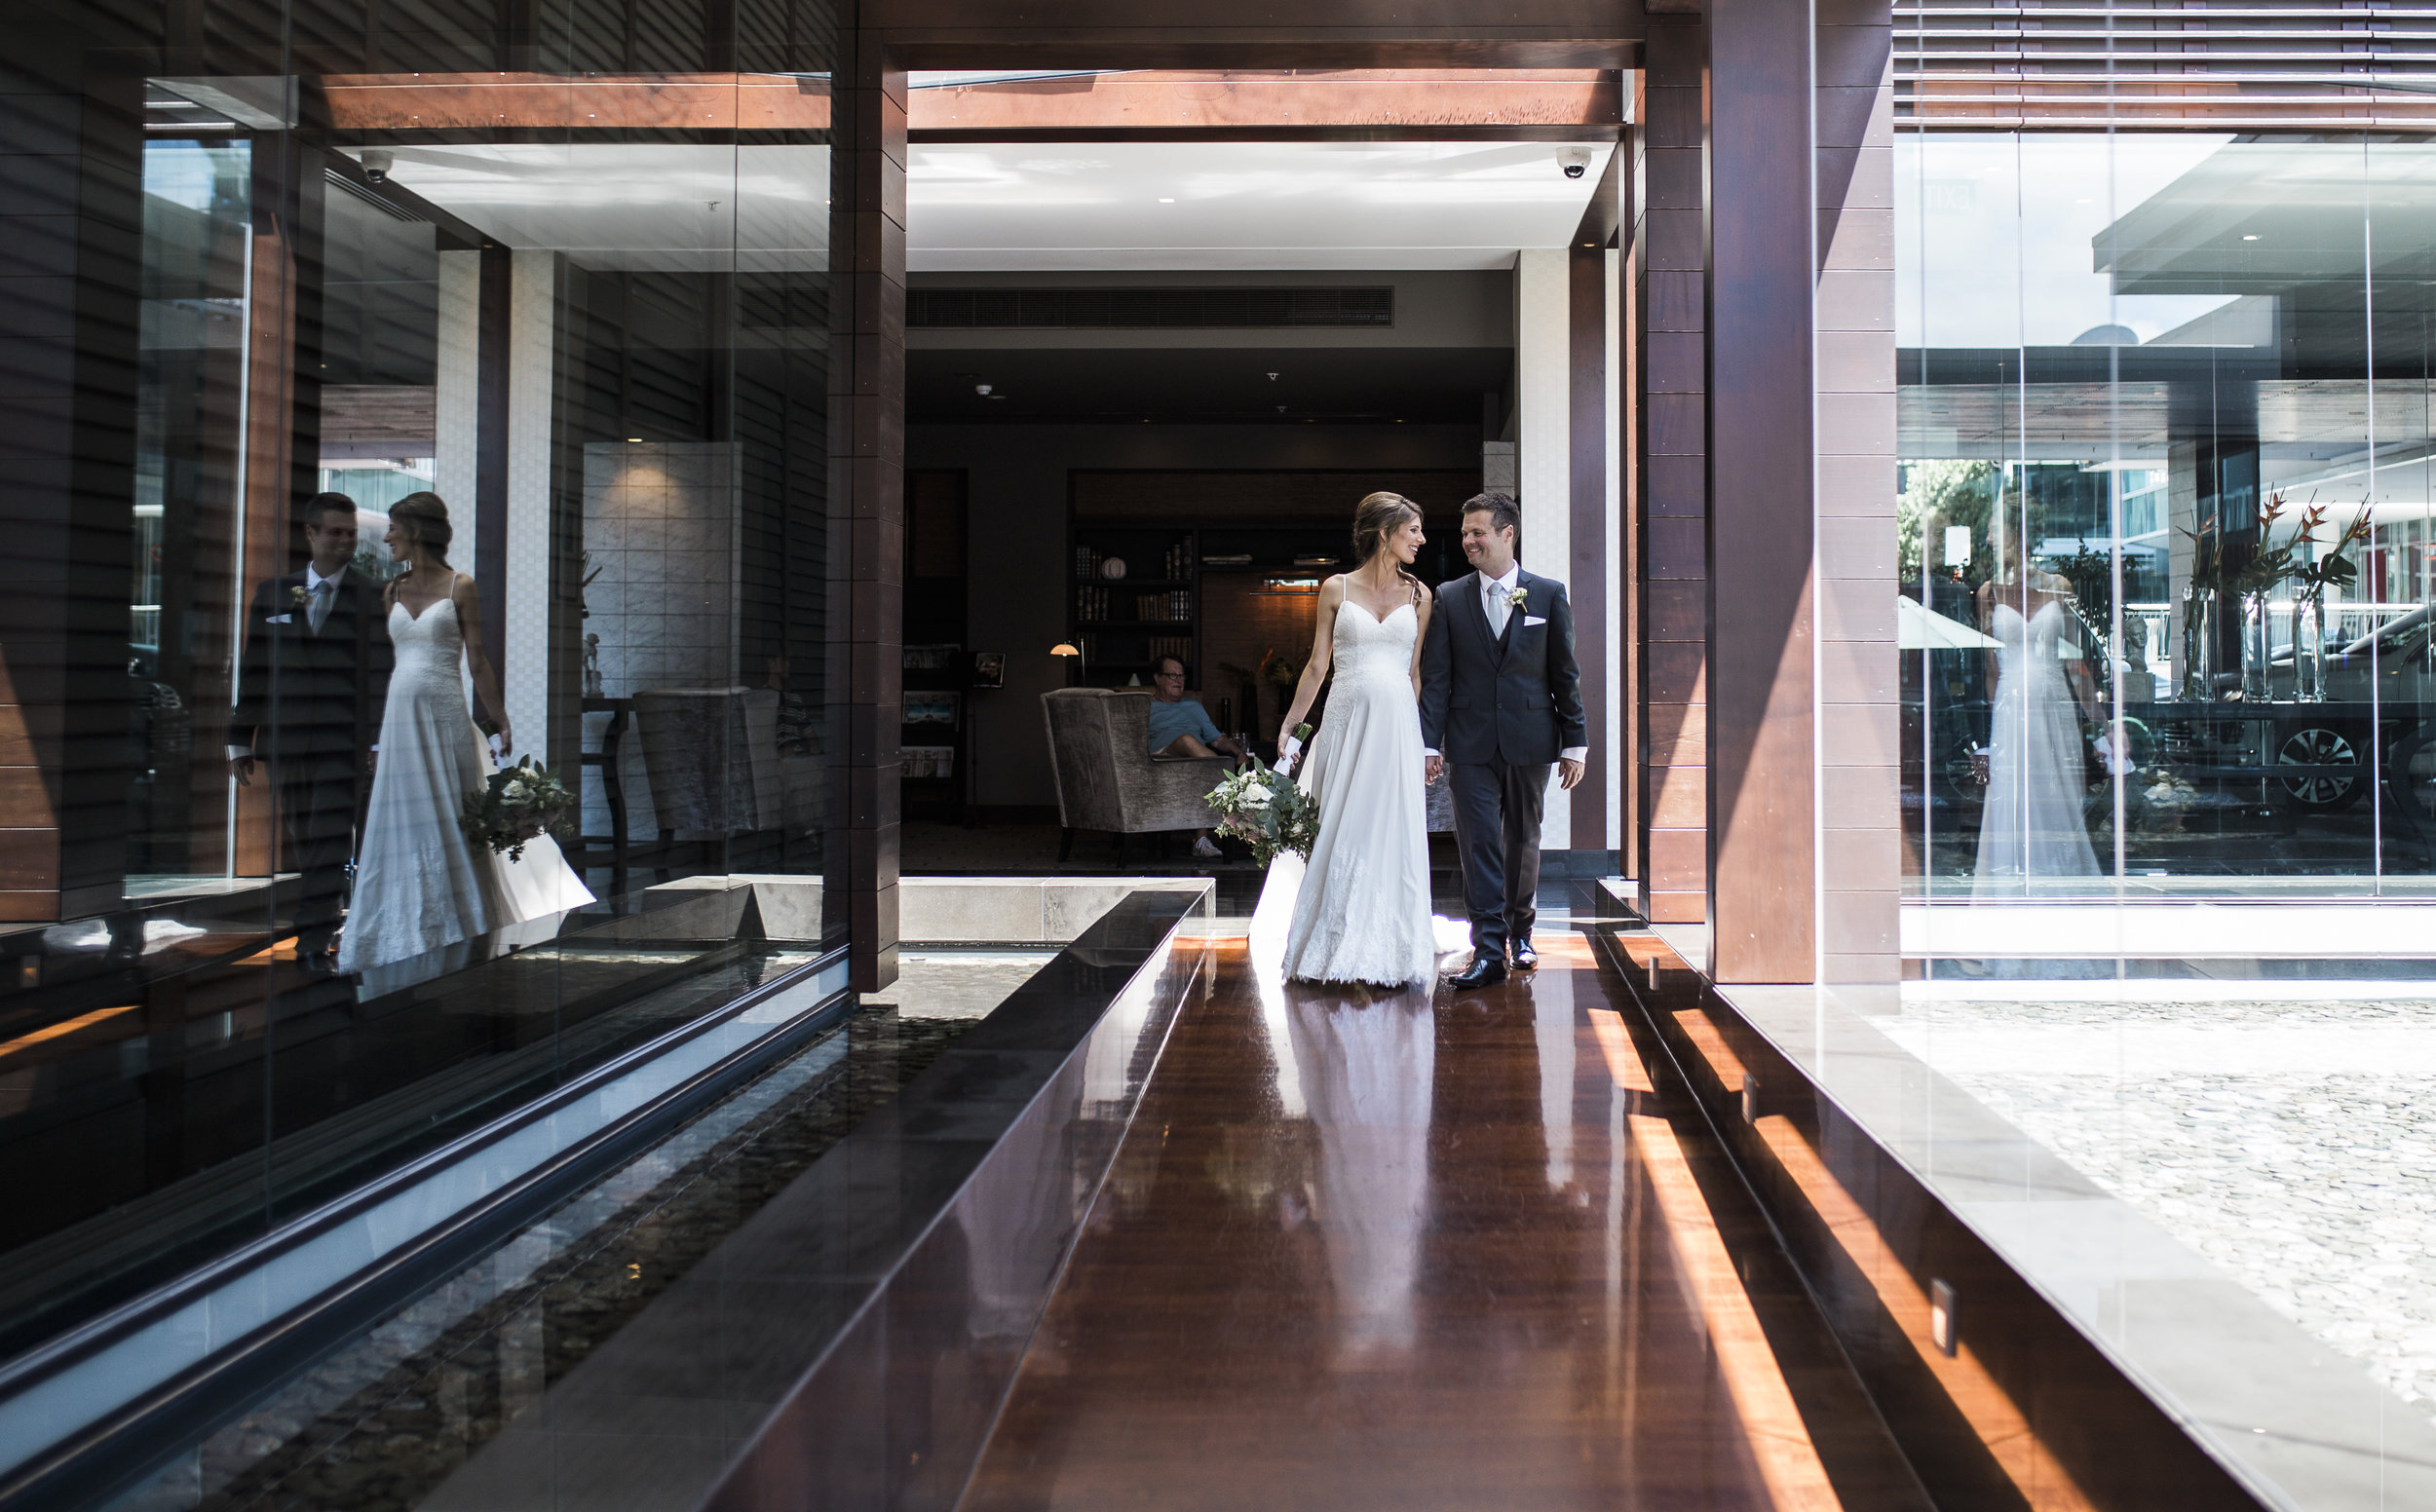 Sofitel Auckland wedding photo of bride and groom